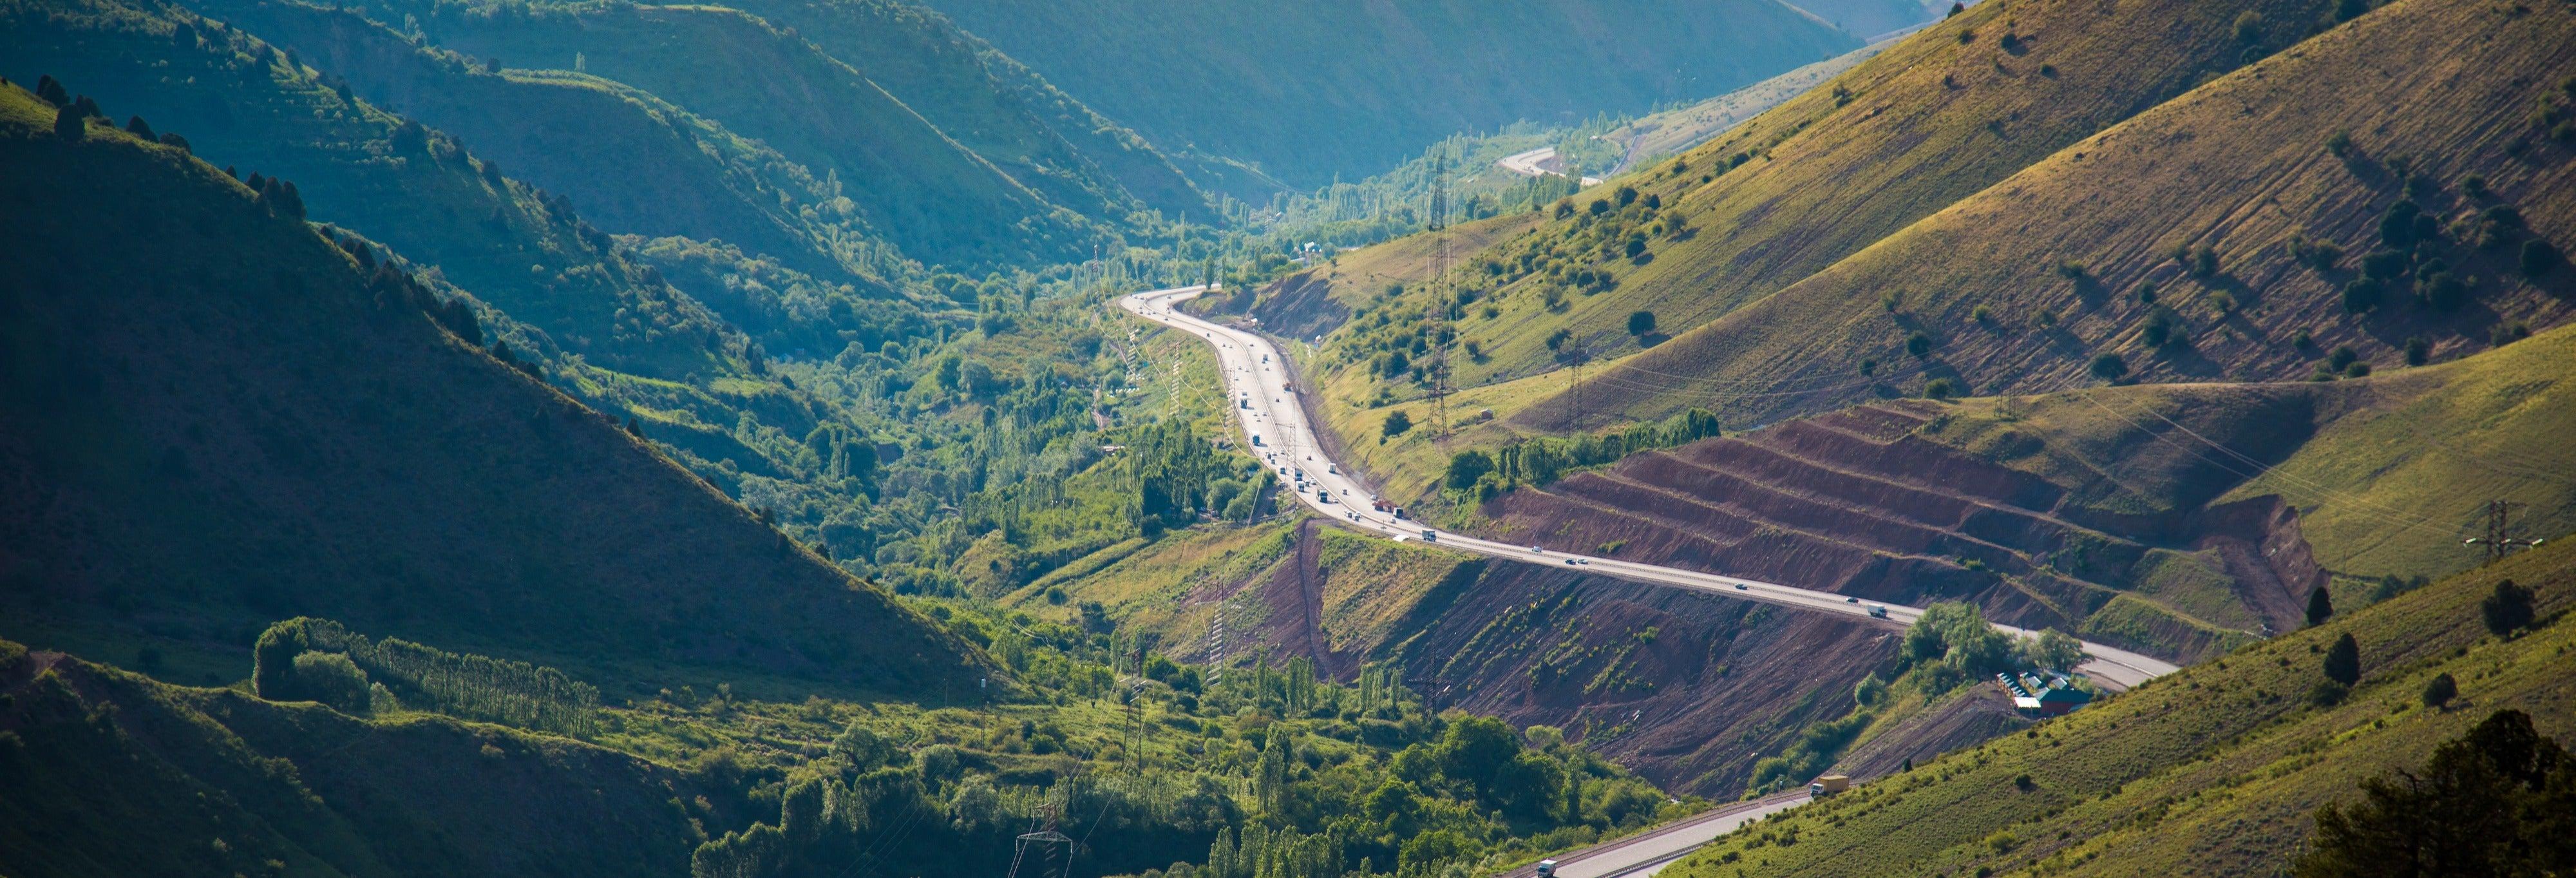 Tour privado de 2 días por el valle de Ferganá